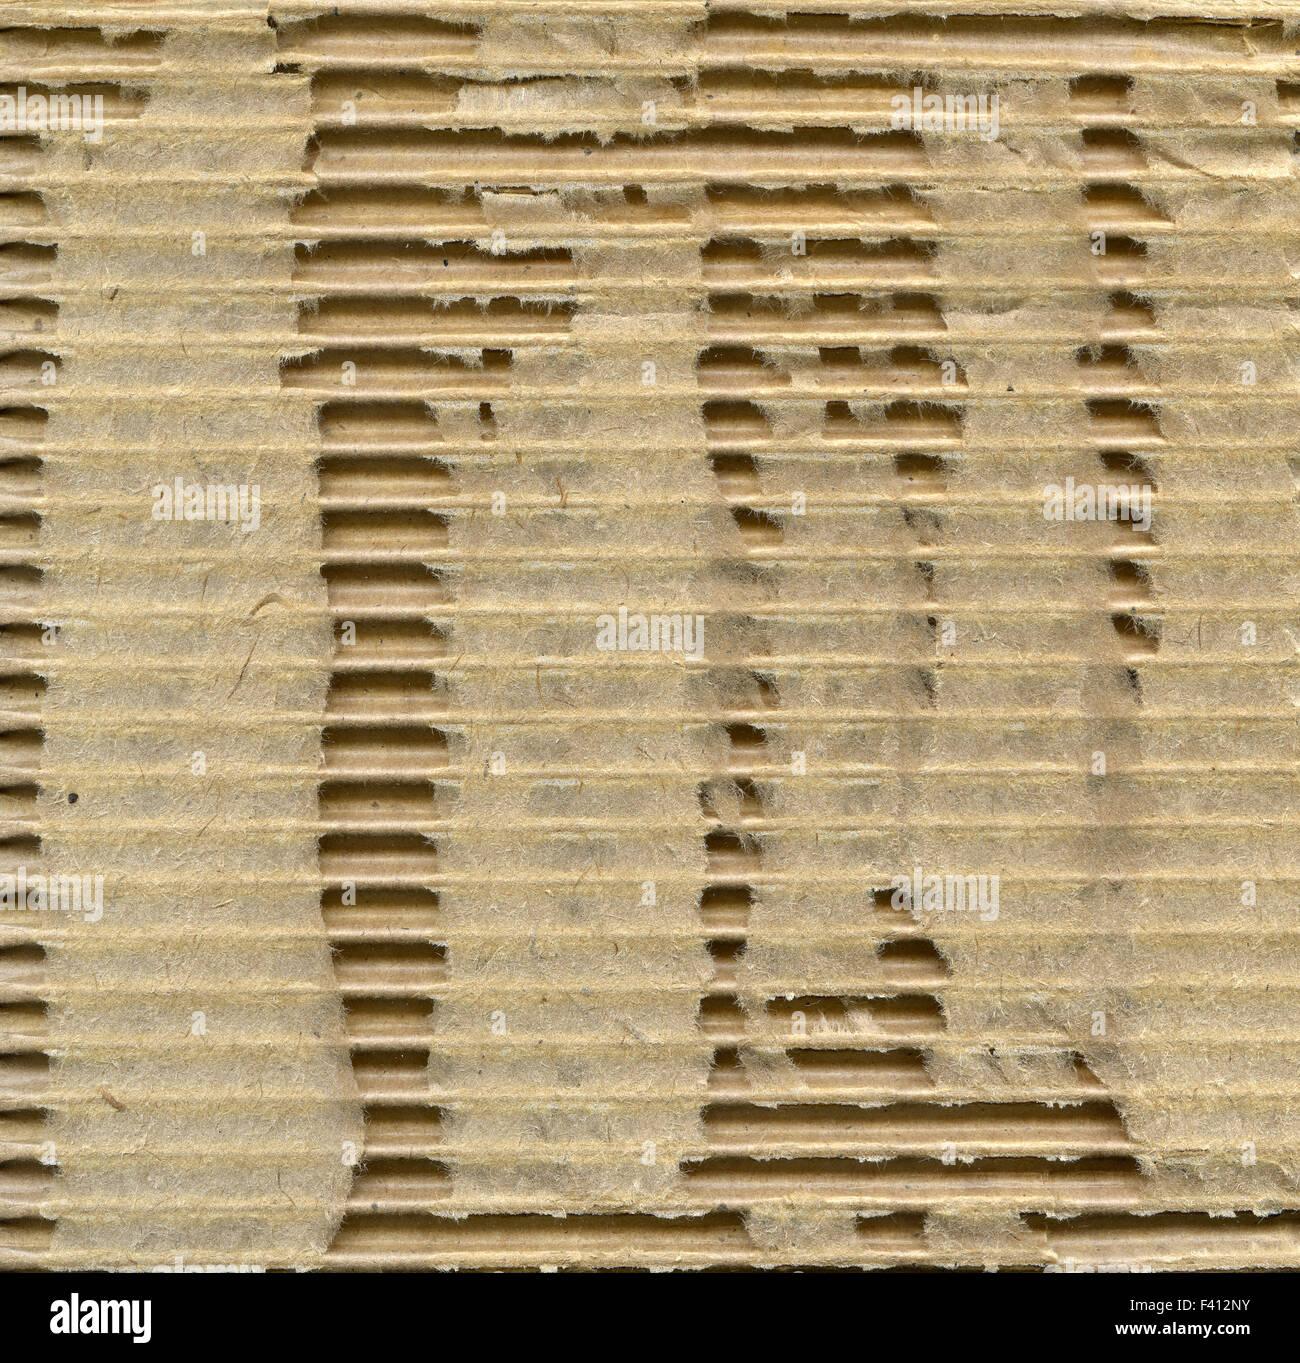 Ragged сardboard - Stock Image